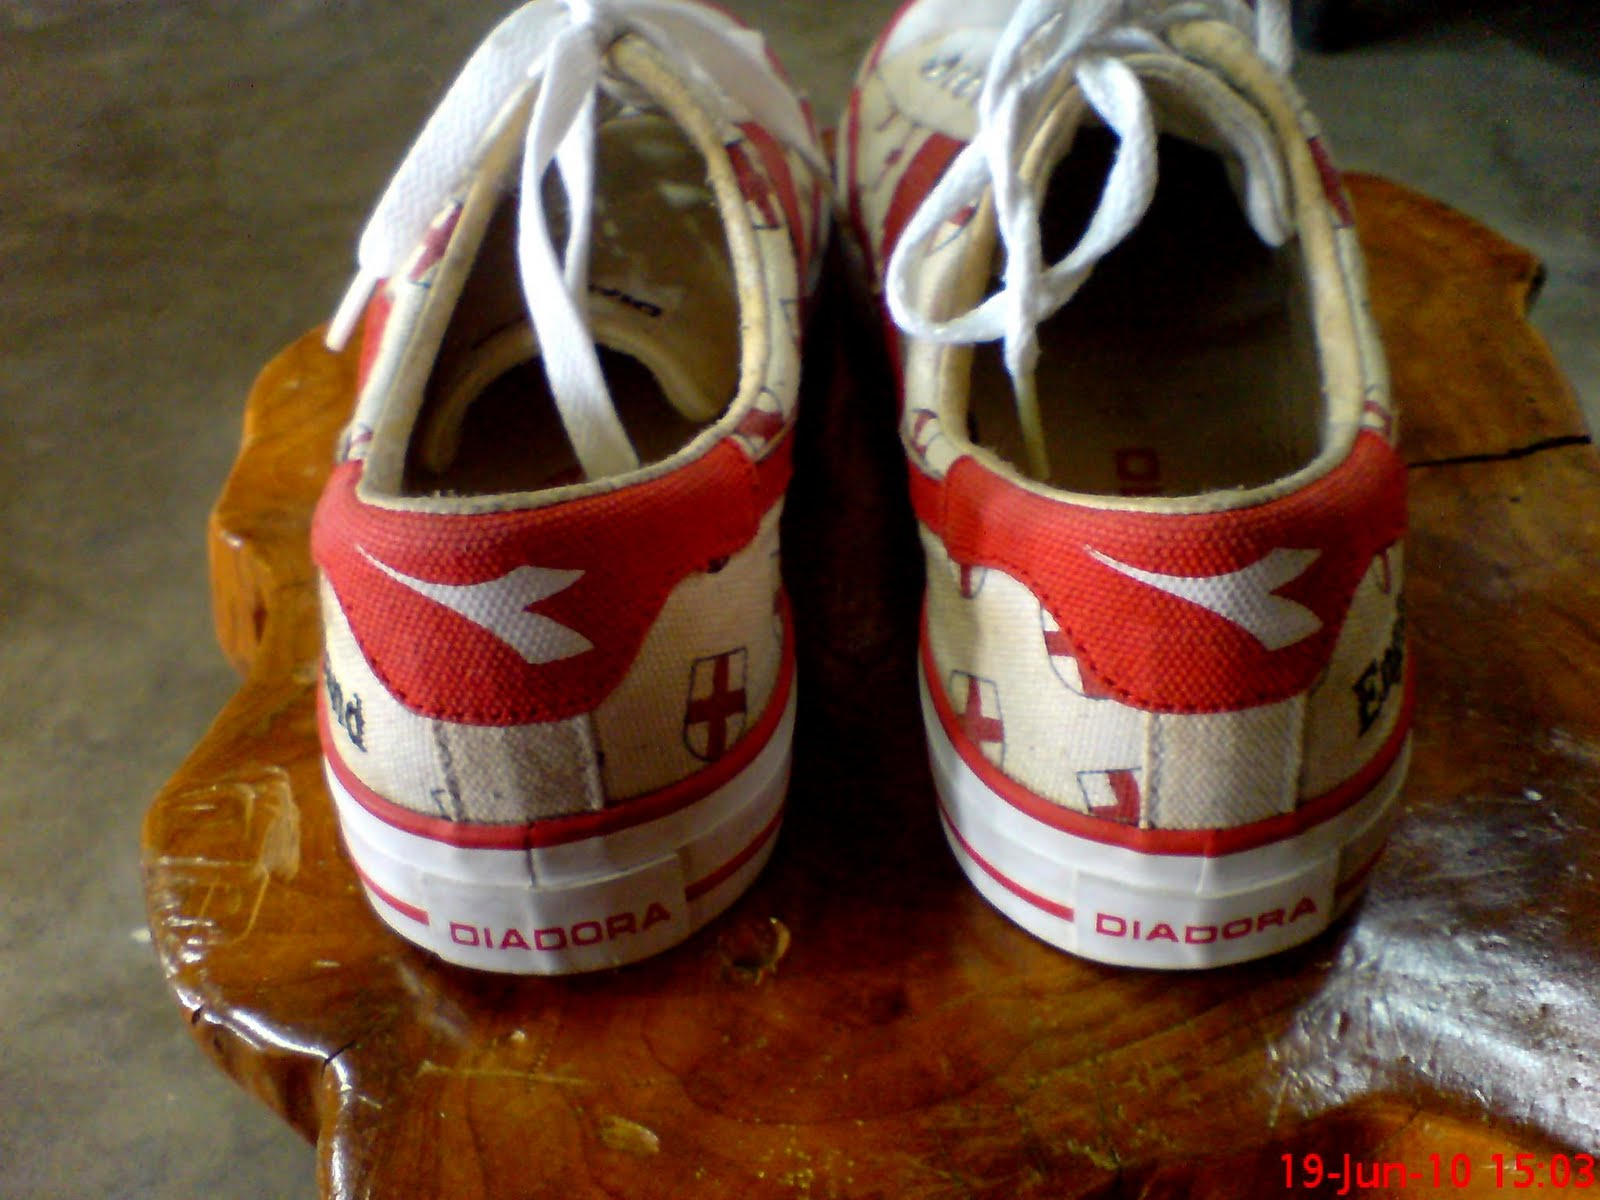 dc5fbf65db550 kasut diadora vintage!!(SOLD OUT). haha..ni khas untuk korg yg minat  england.dlm